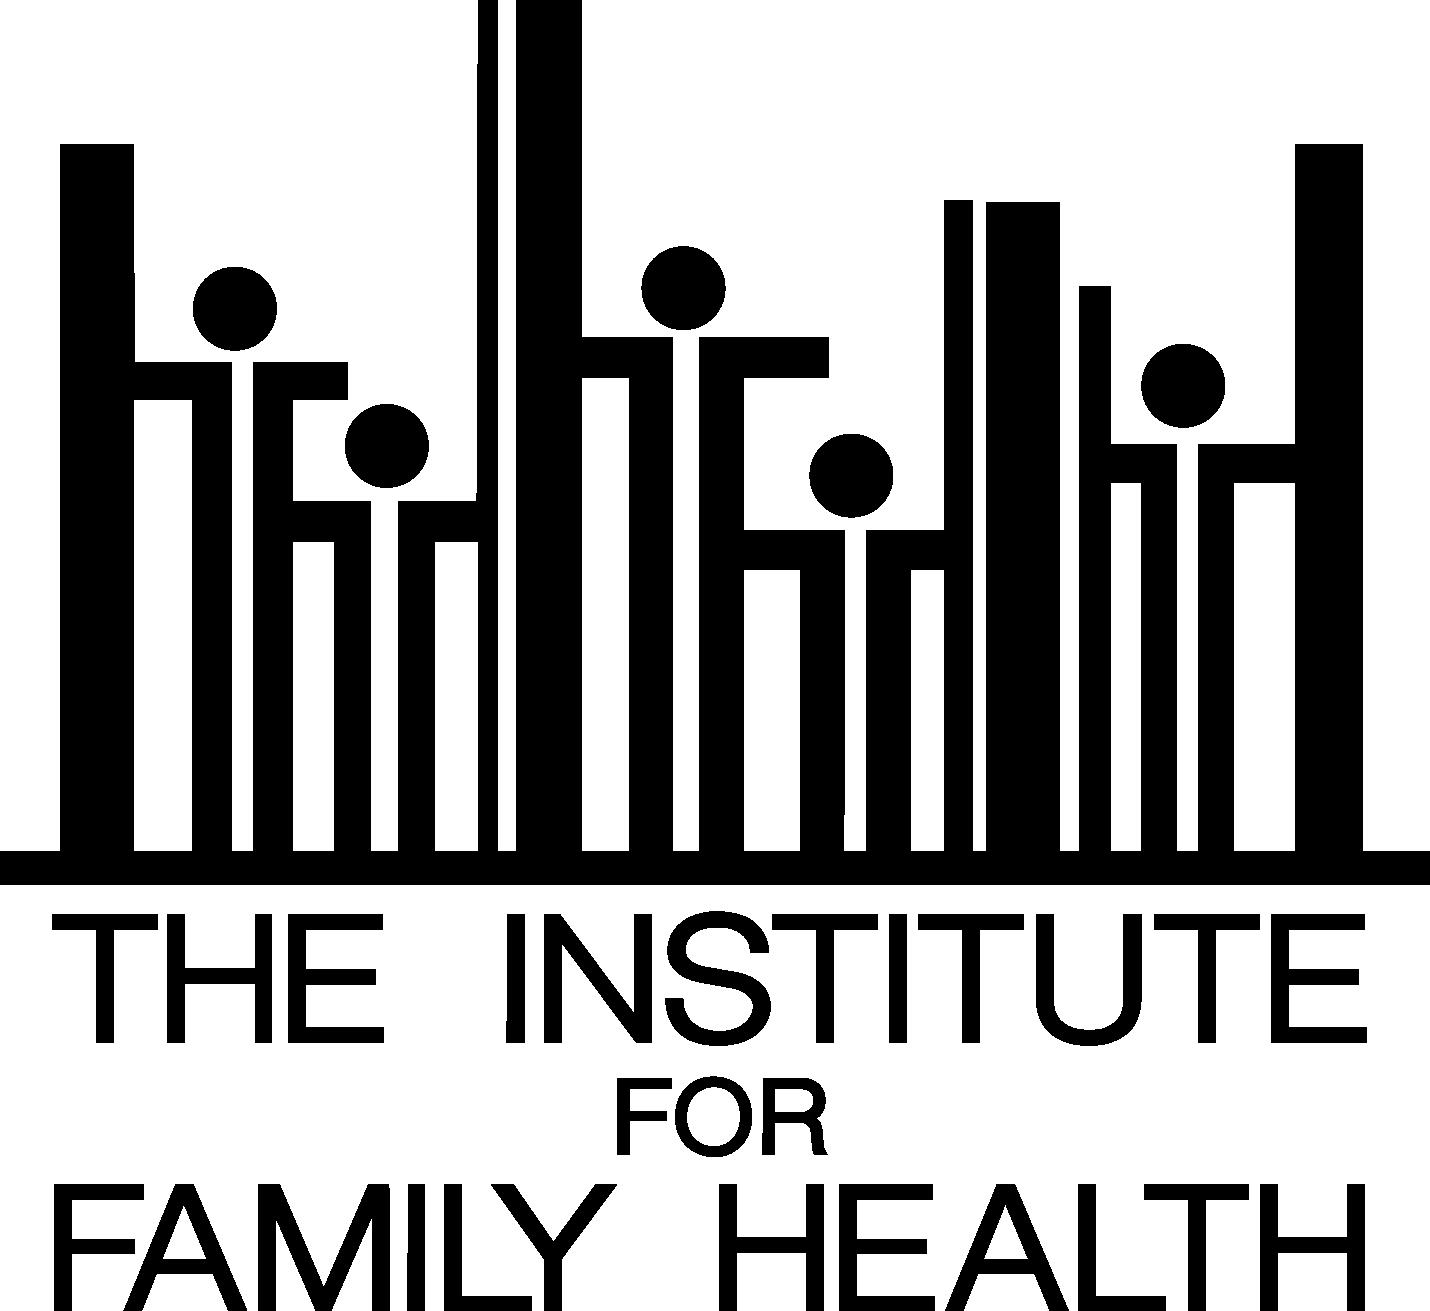 The Institute for Family Health logo